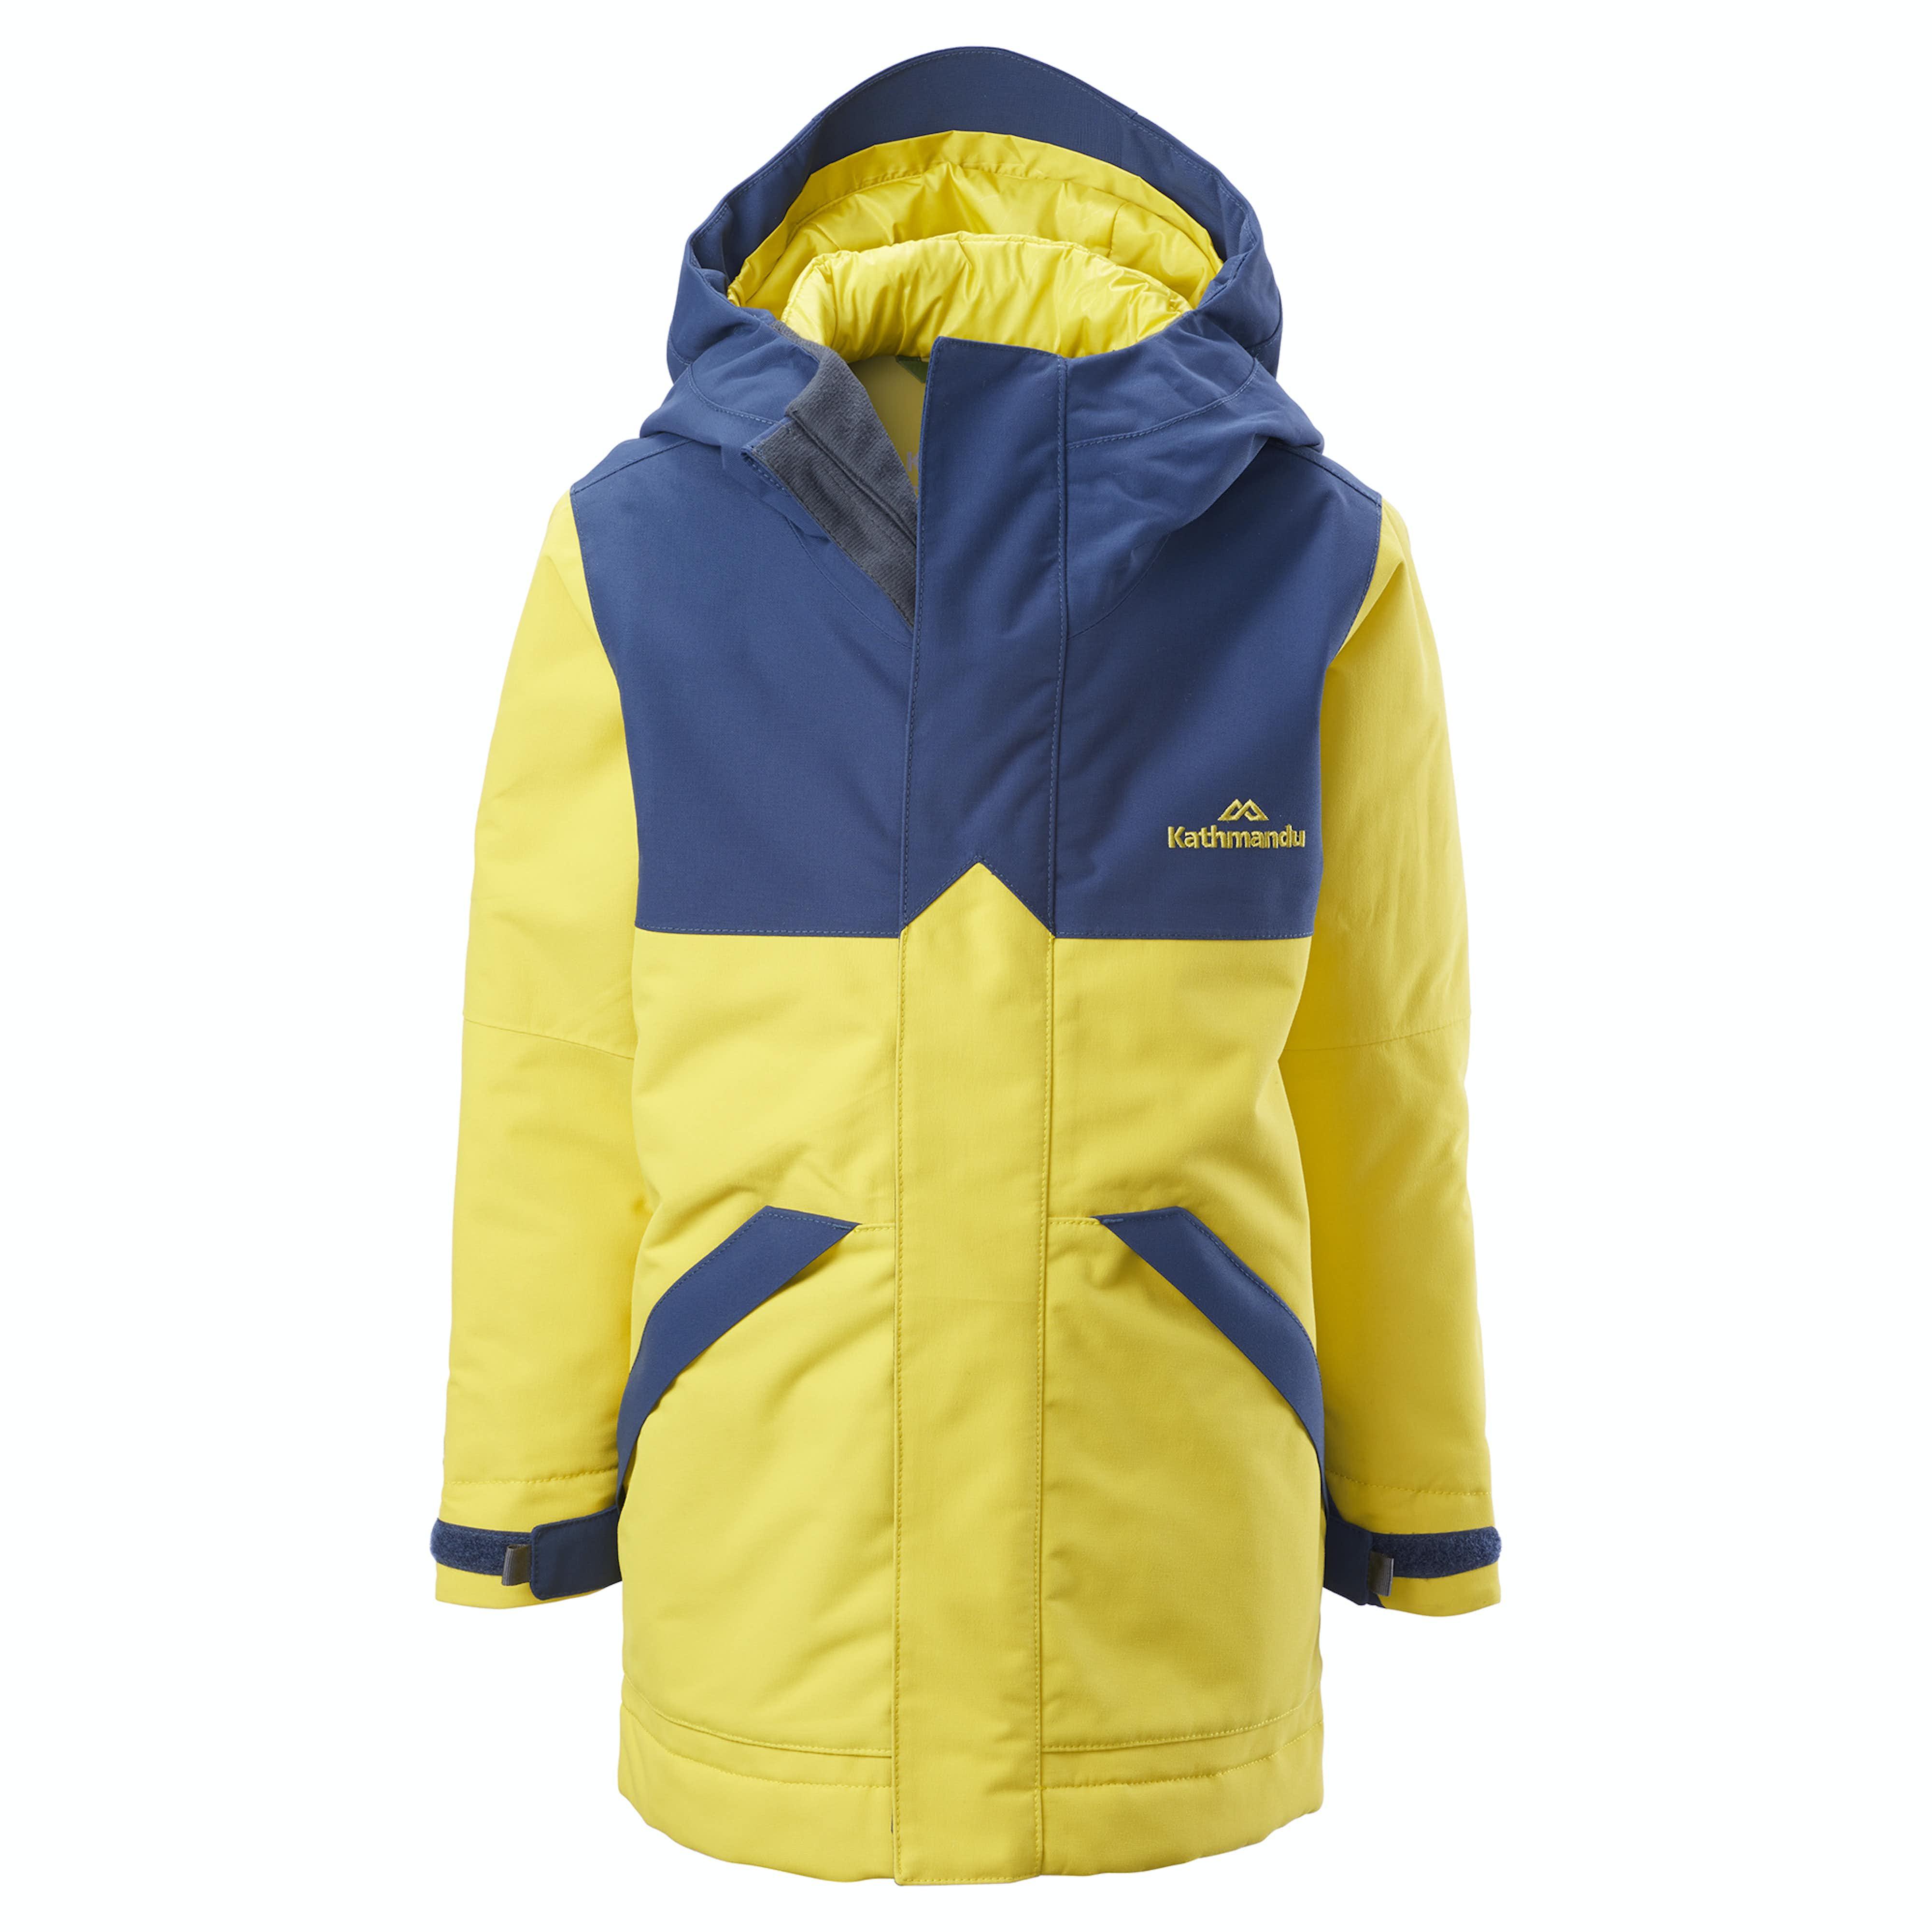 ff9210833 Kids Outdoor Gear | Shop Boys & Girls Outdoor Wear Today!